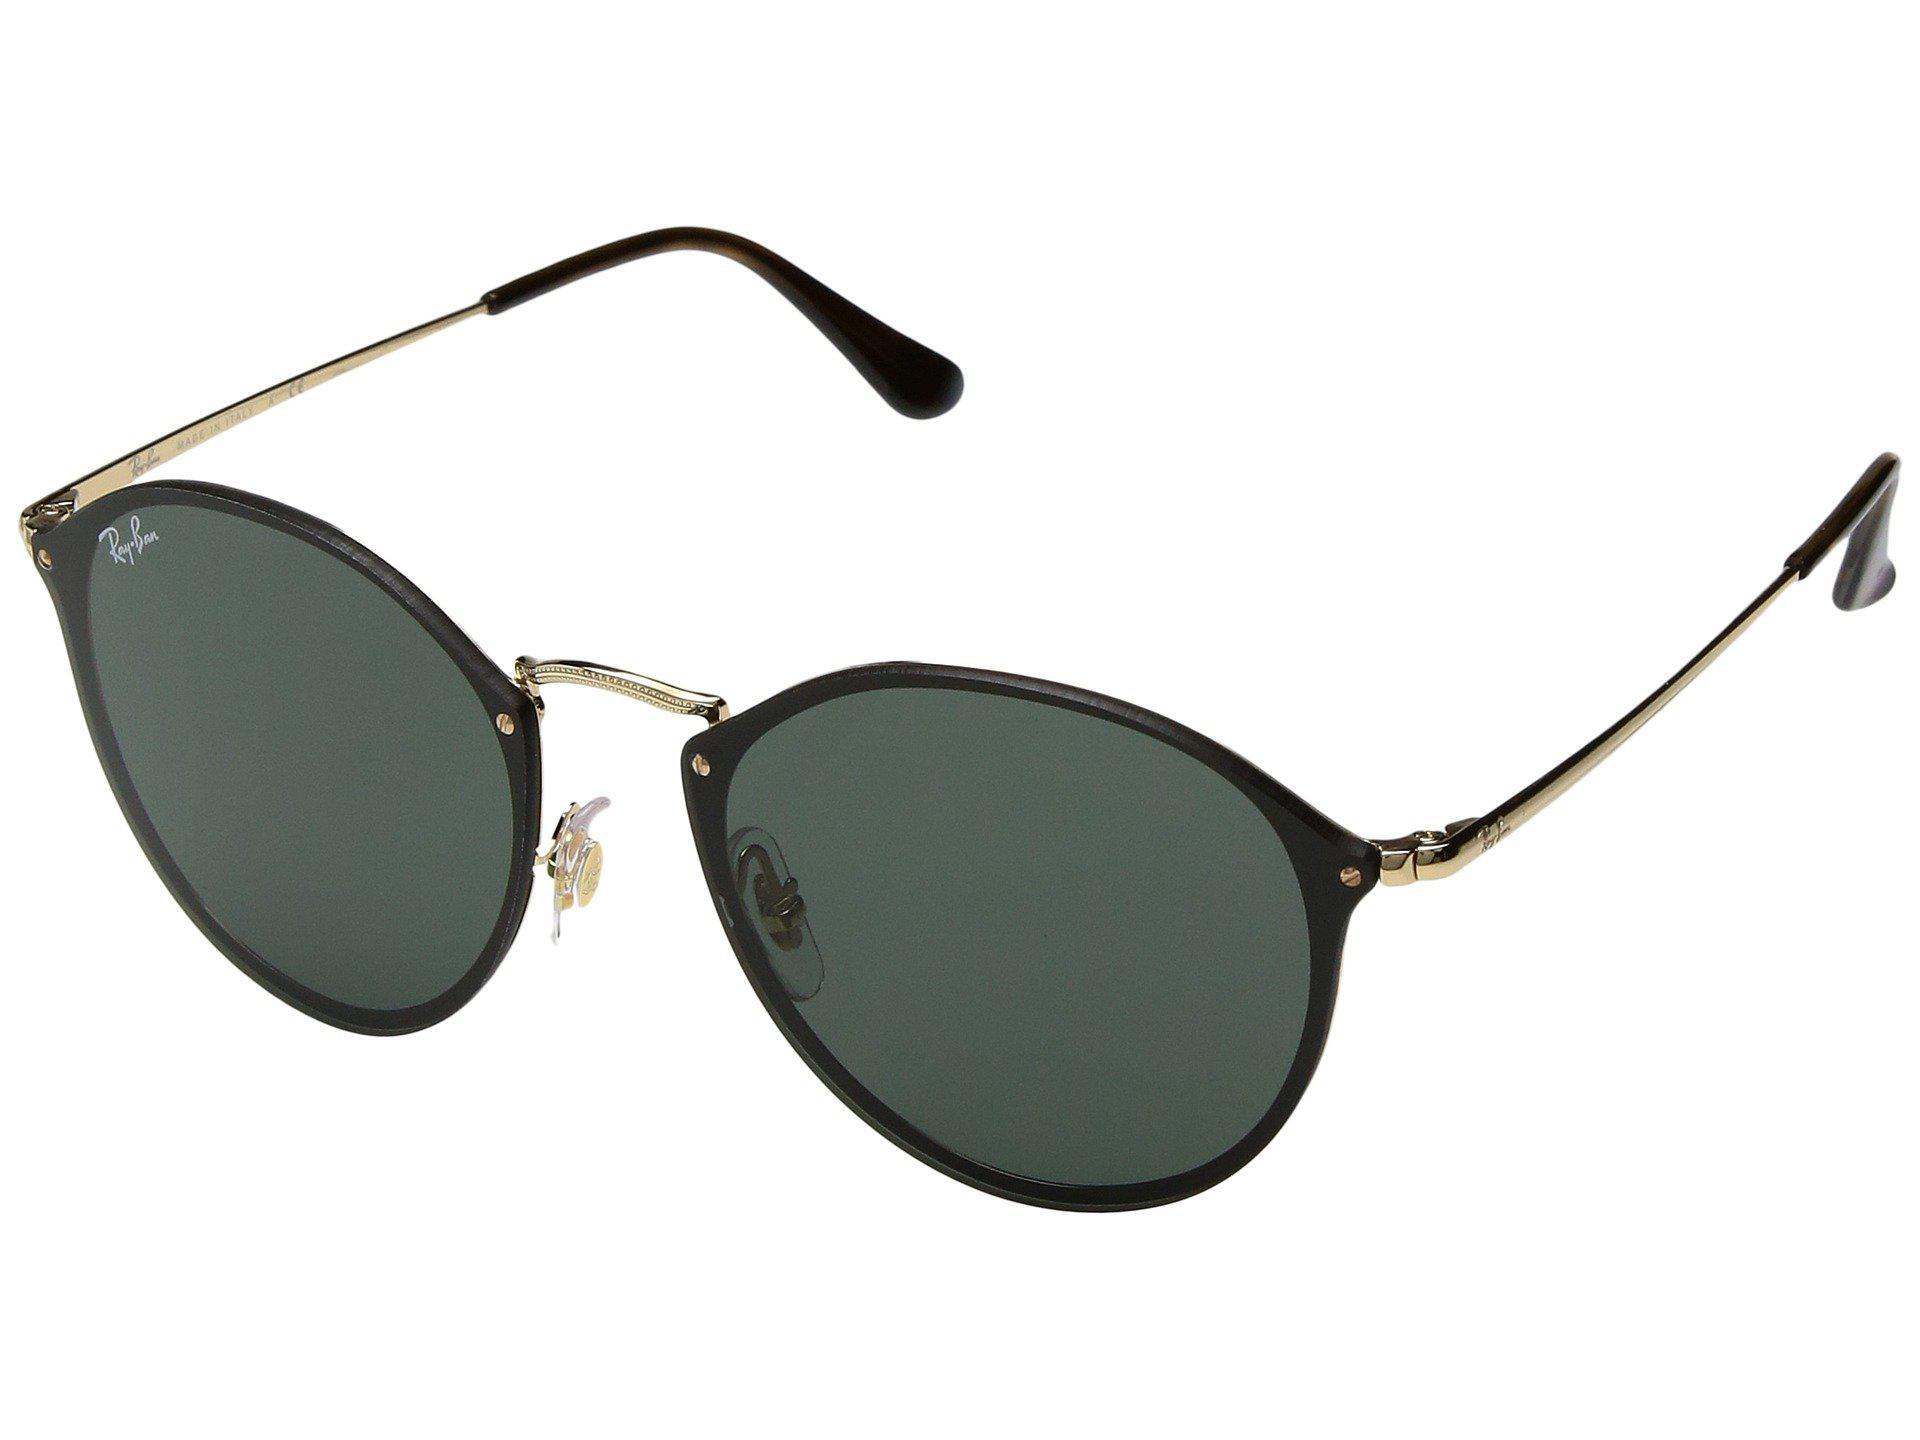 03f9ba91bc Ray-Ban. Women s Blaze Round Rb3574n 59mm (gold green Classic) Fashion  Sunglasses